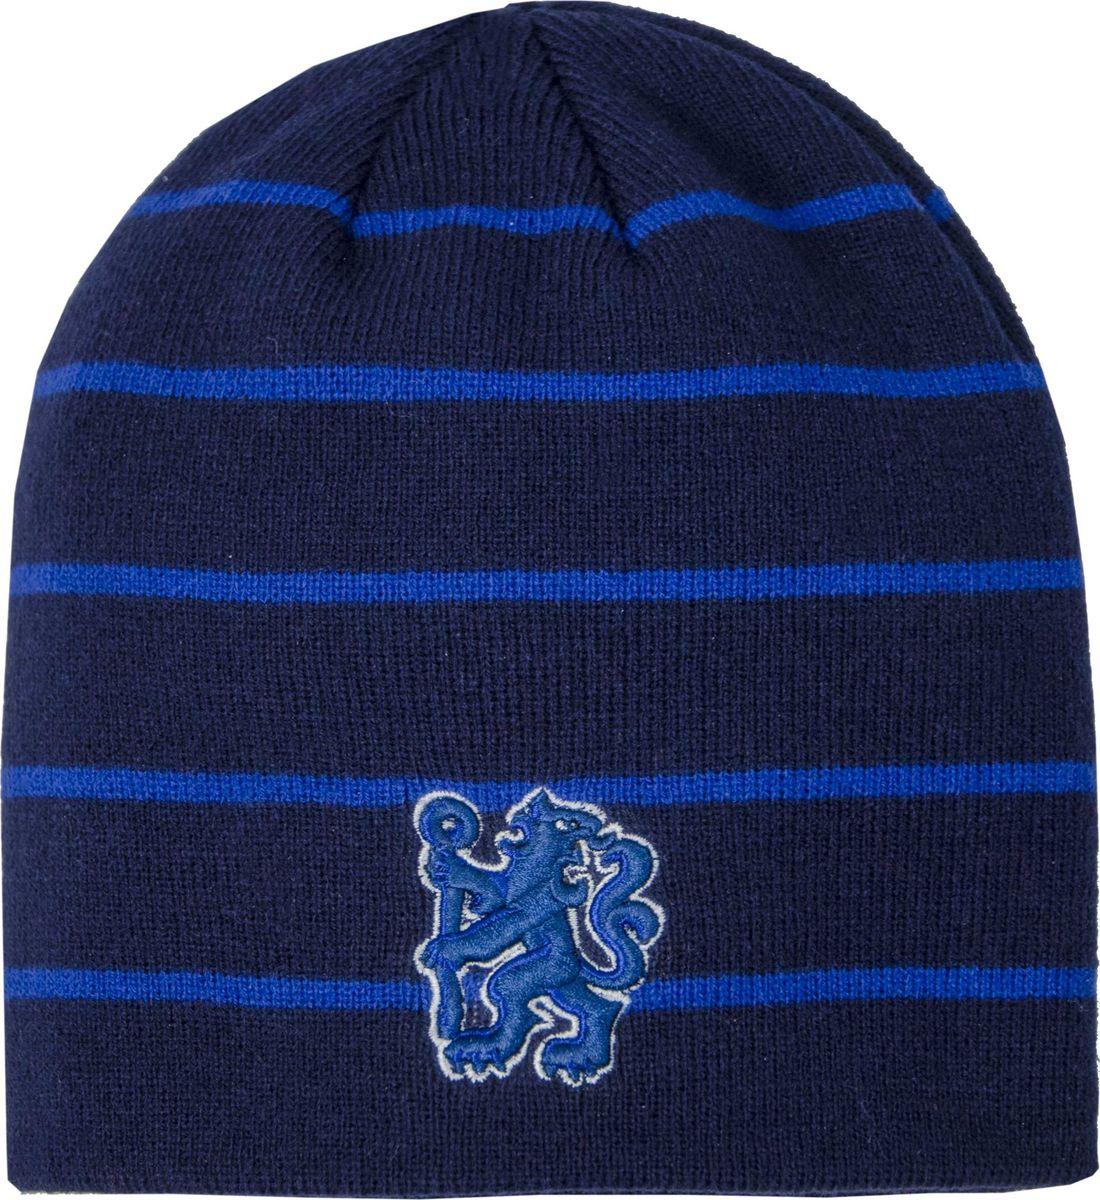 Шапка мужская Atributika & Club Chelsea, цвет: синий. 08012. Размер 55/58